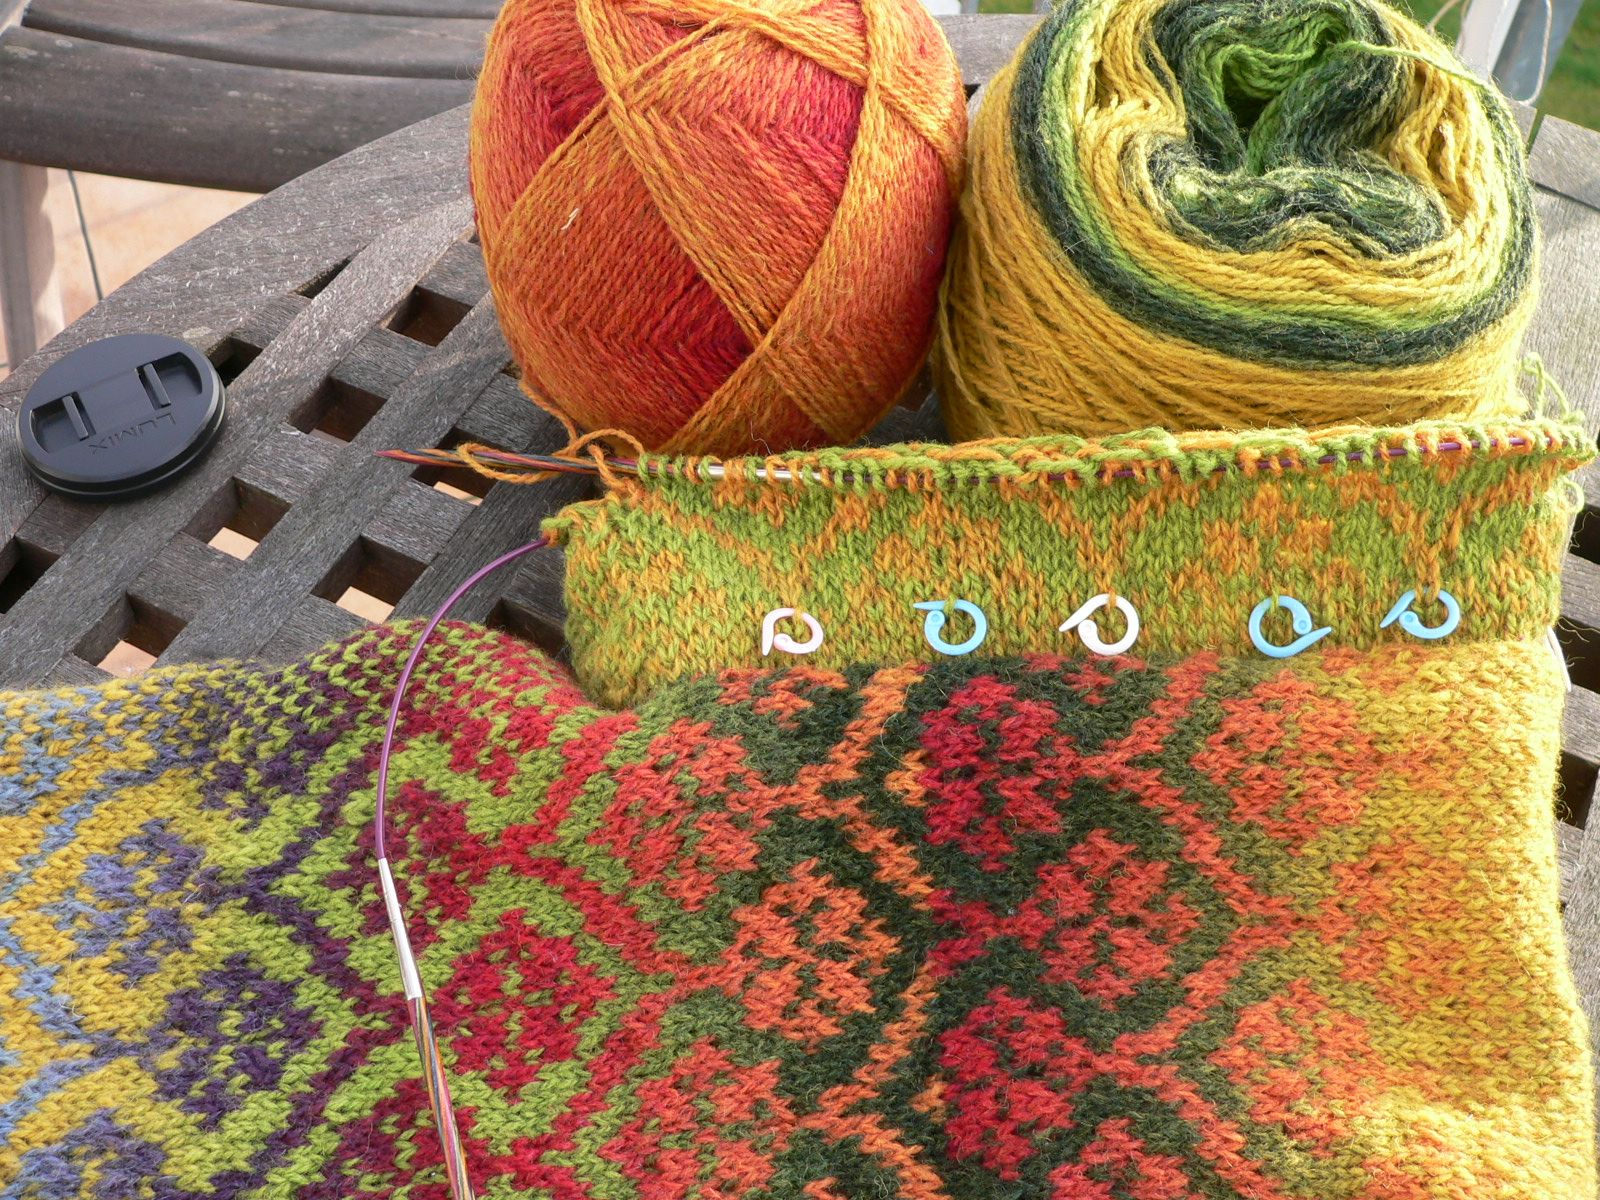 The secret to speed in fair isle knitting bernat klein the secret to speed in fair isle knitting bankloansurffo Gallery